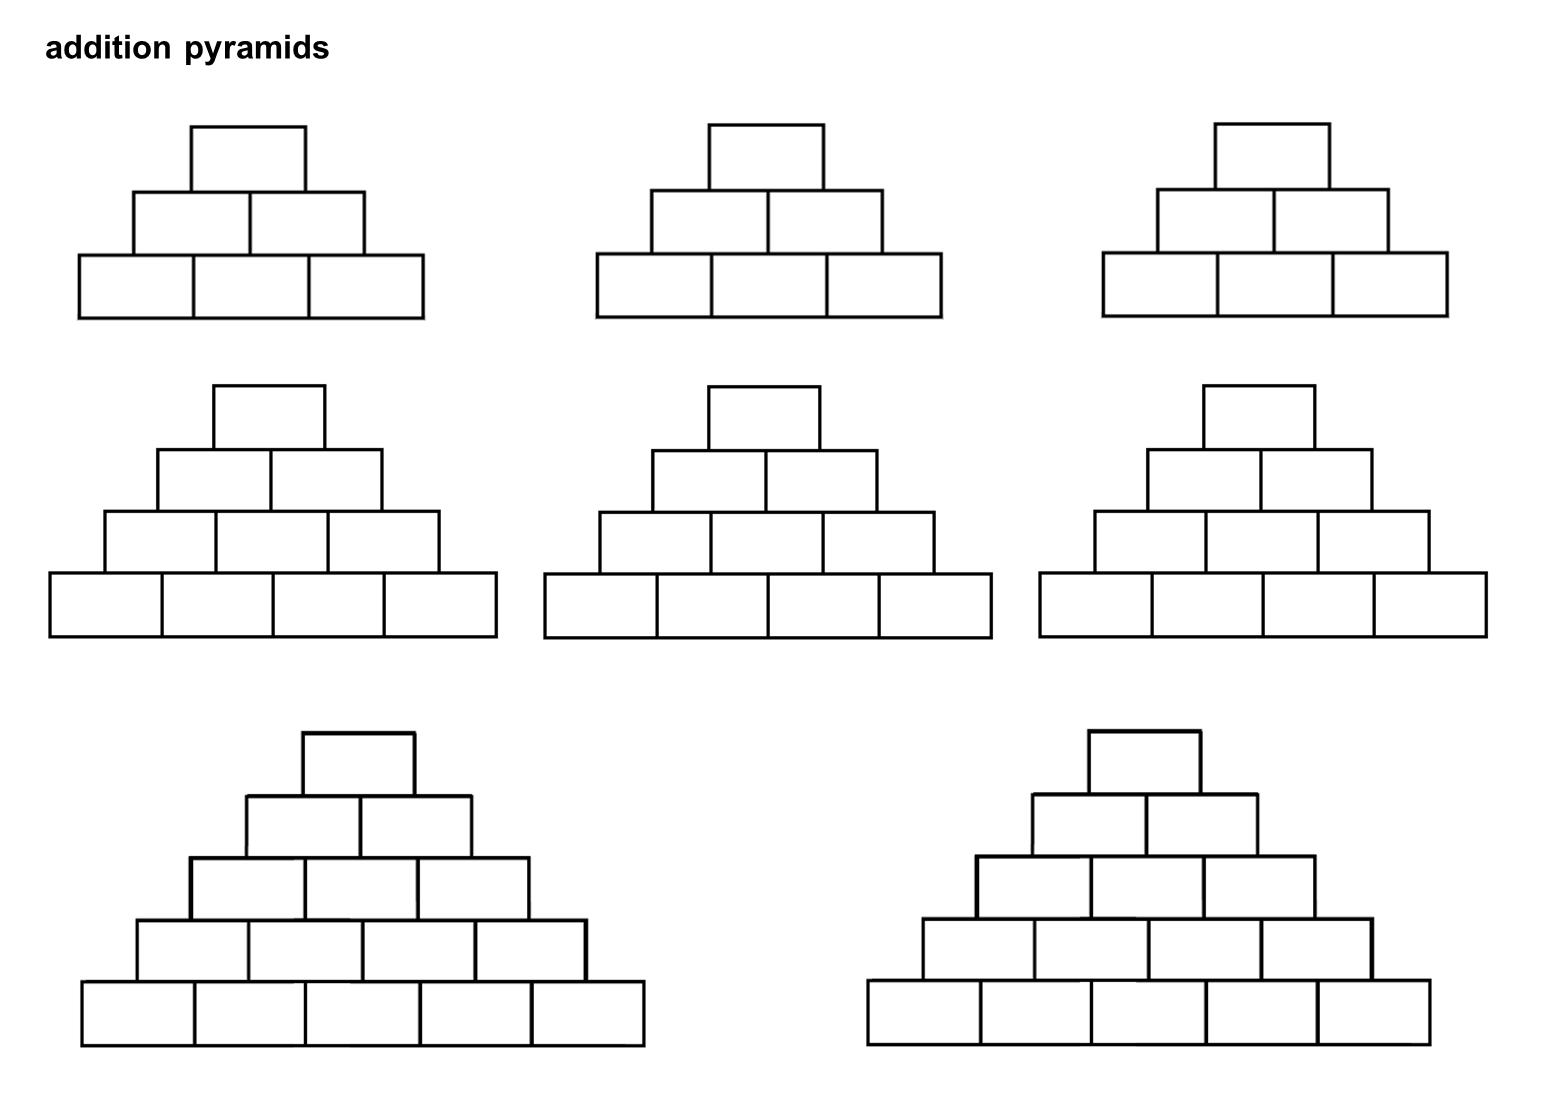 Blank Pyramid Diagram 5 20 Hp Briggs And Stratton Engine Median Don Steward Mathematics Teaching Number Pyramids